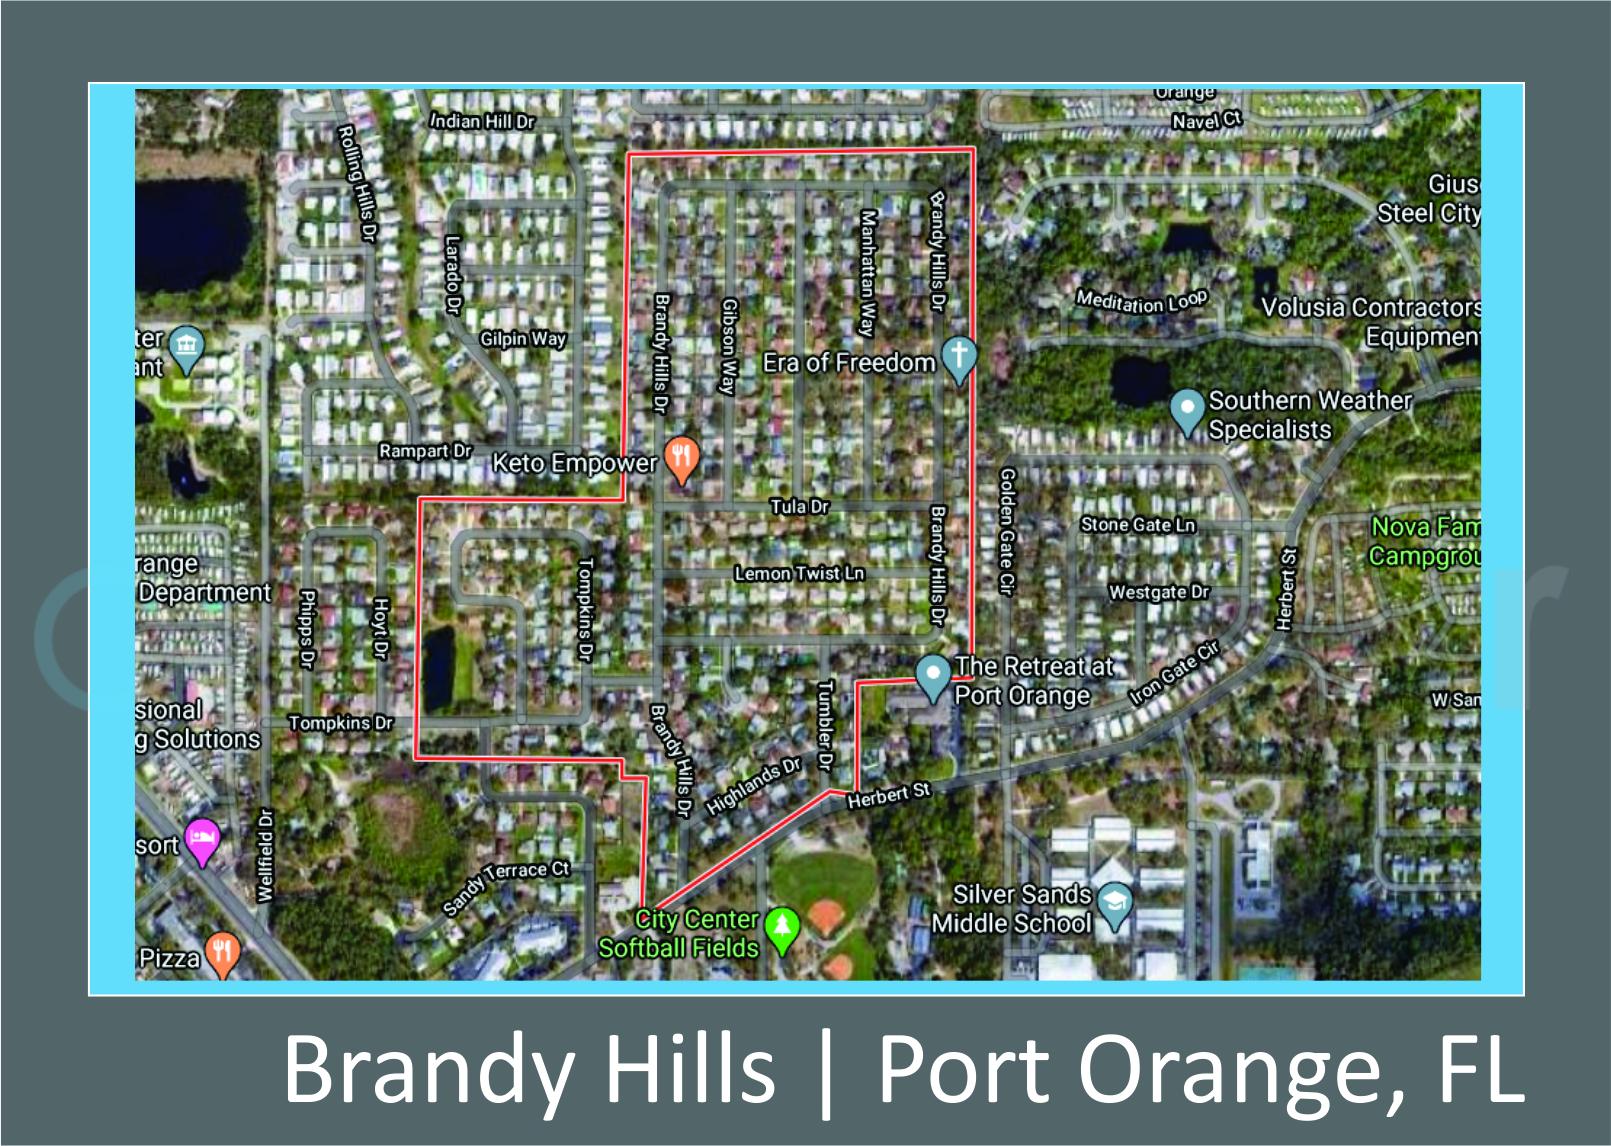 Map of Brandy Hills, Port Orange, FL